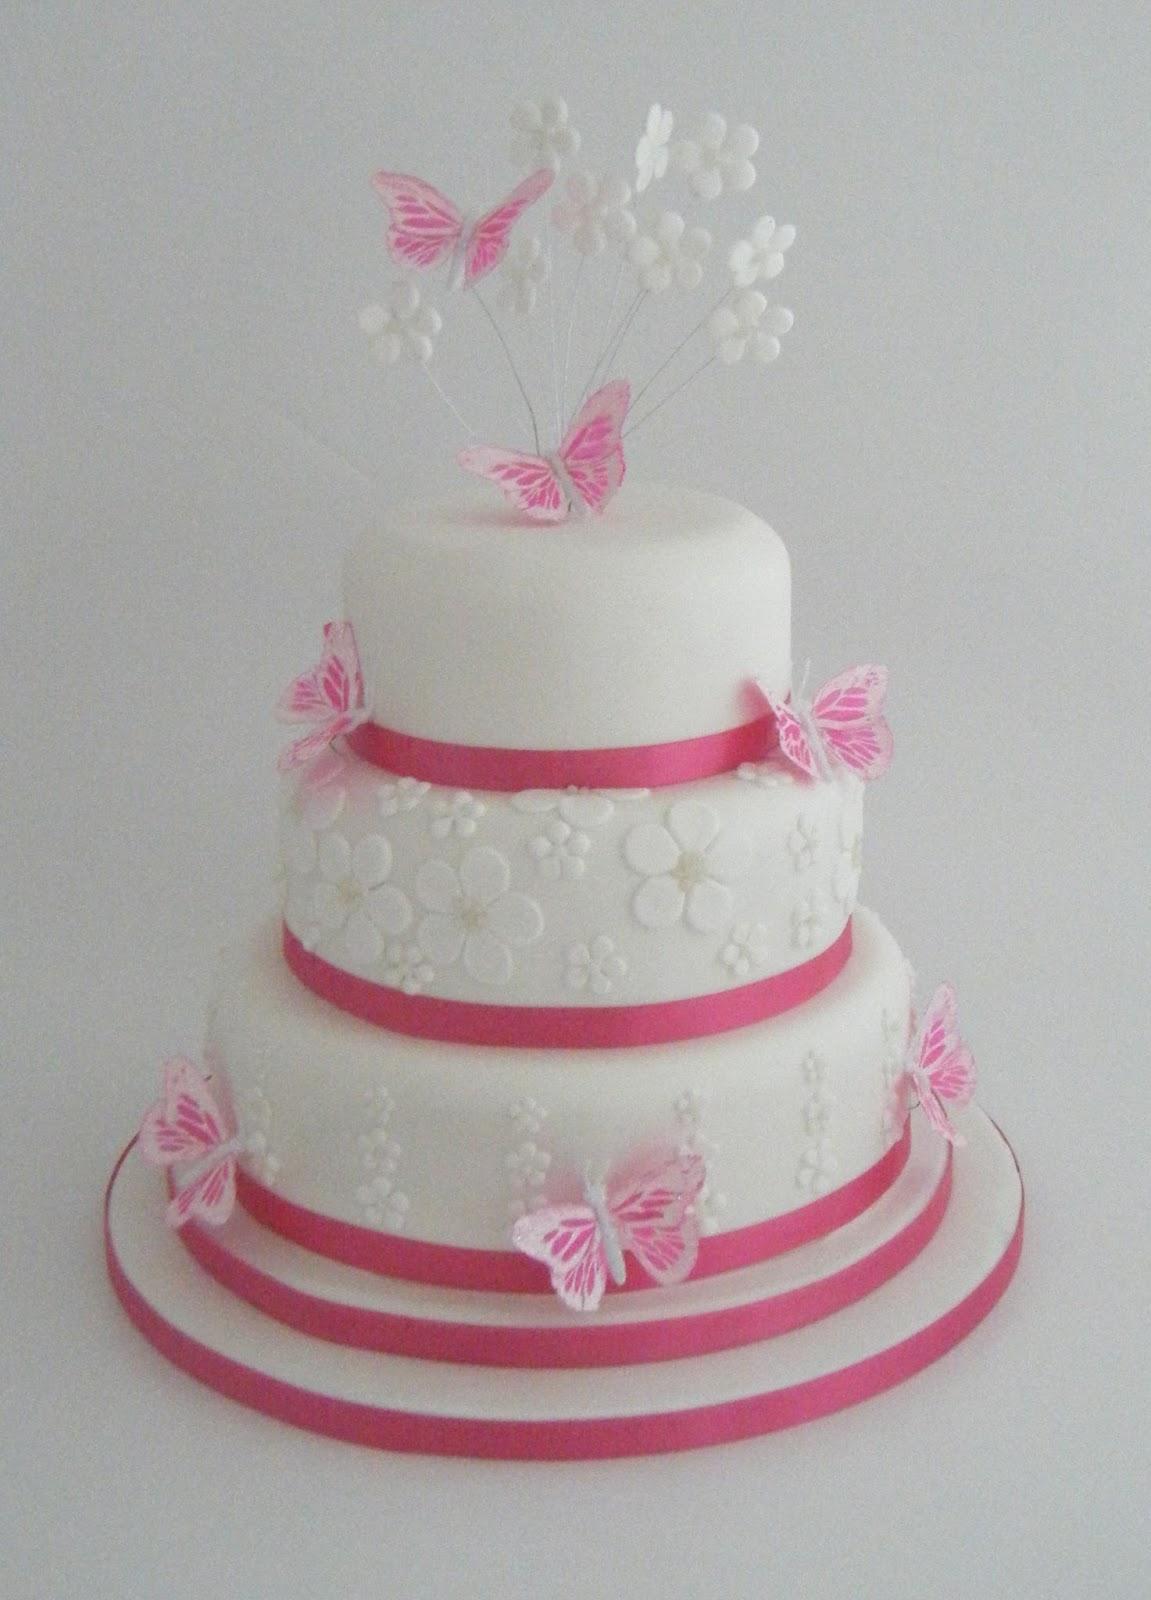 butterfly birthday cake decorating ideas decoration image idea - Wedding Cake Design Ideas